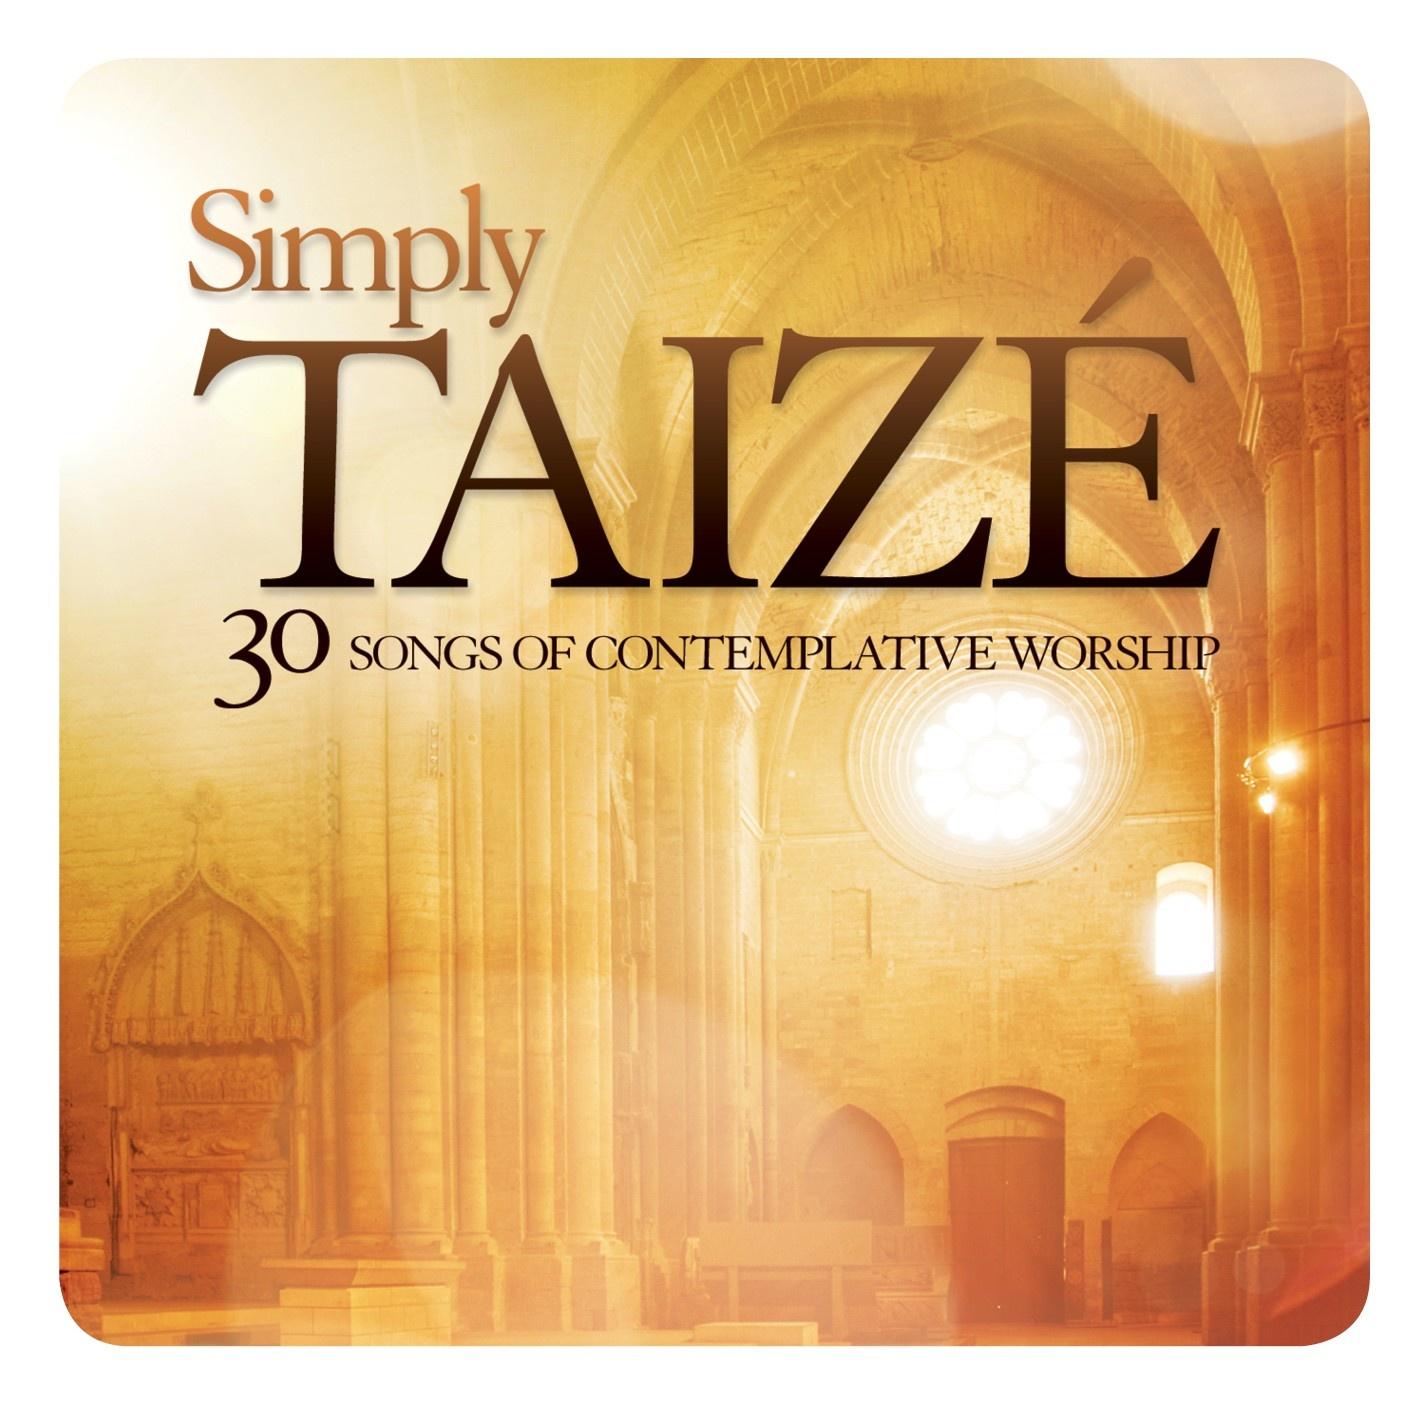 Simply Taizé - 30 Songs Of Contemplative Worship (2CD)